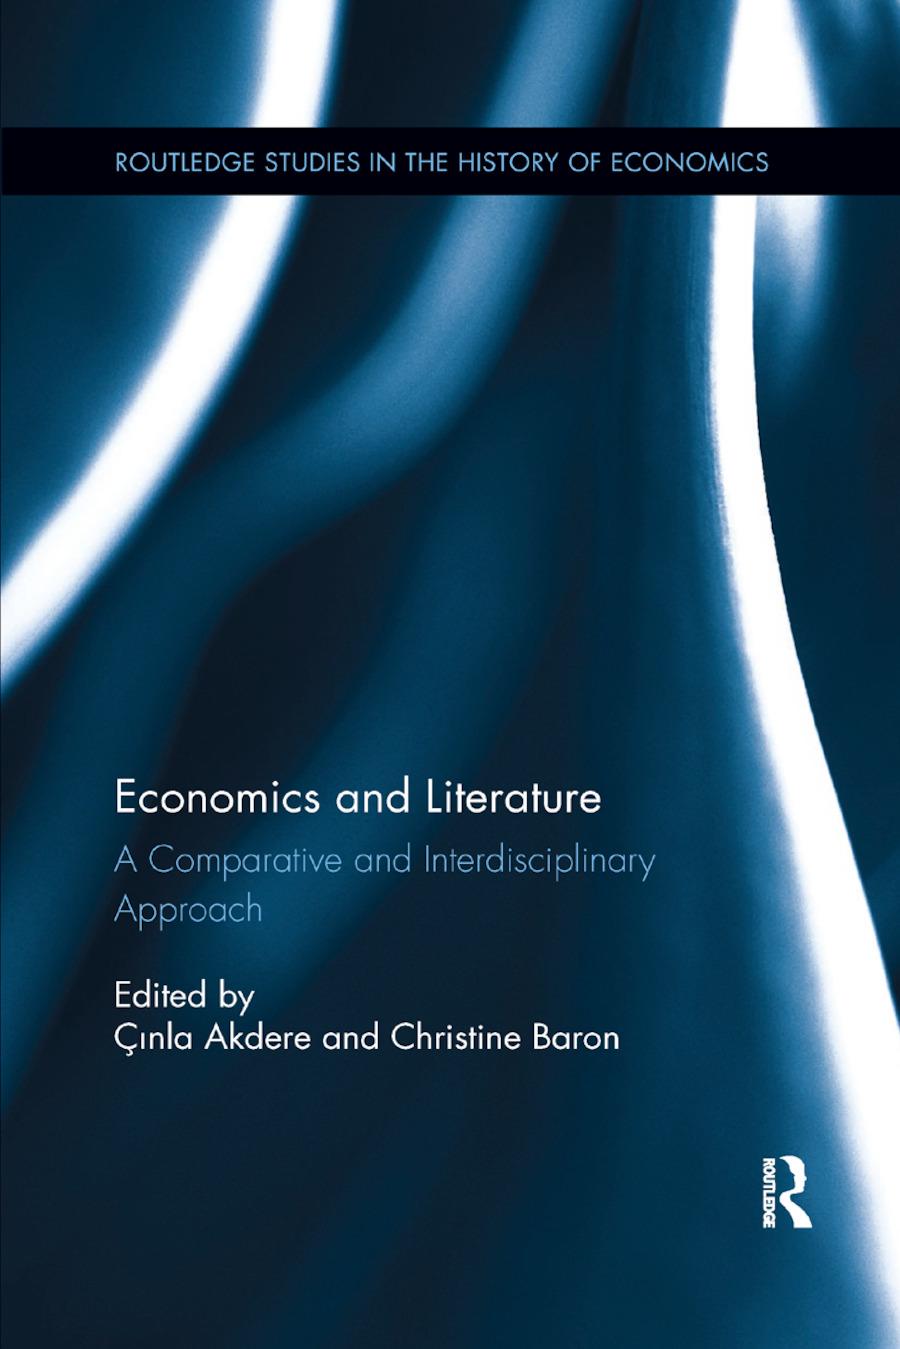 Economics and Literature: A Comparative and Interdisciplinary Approach book cover